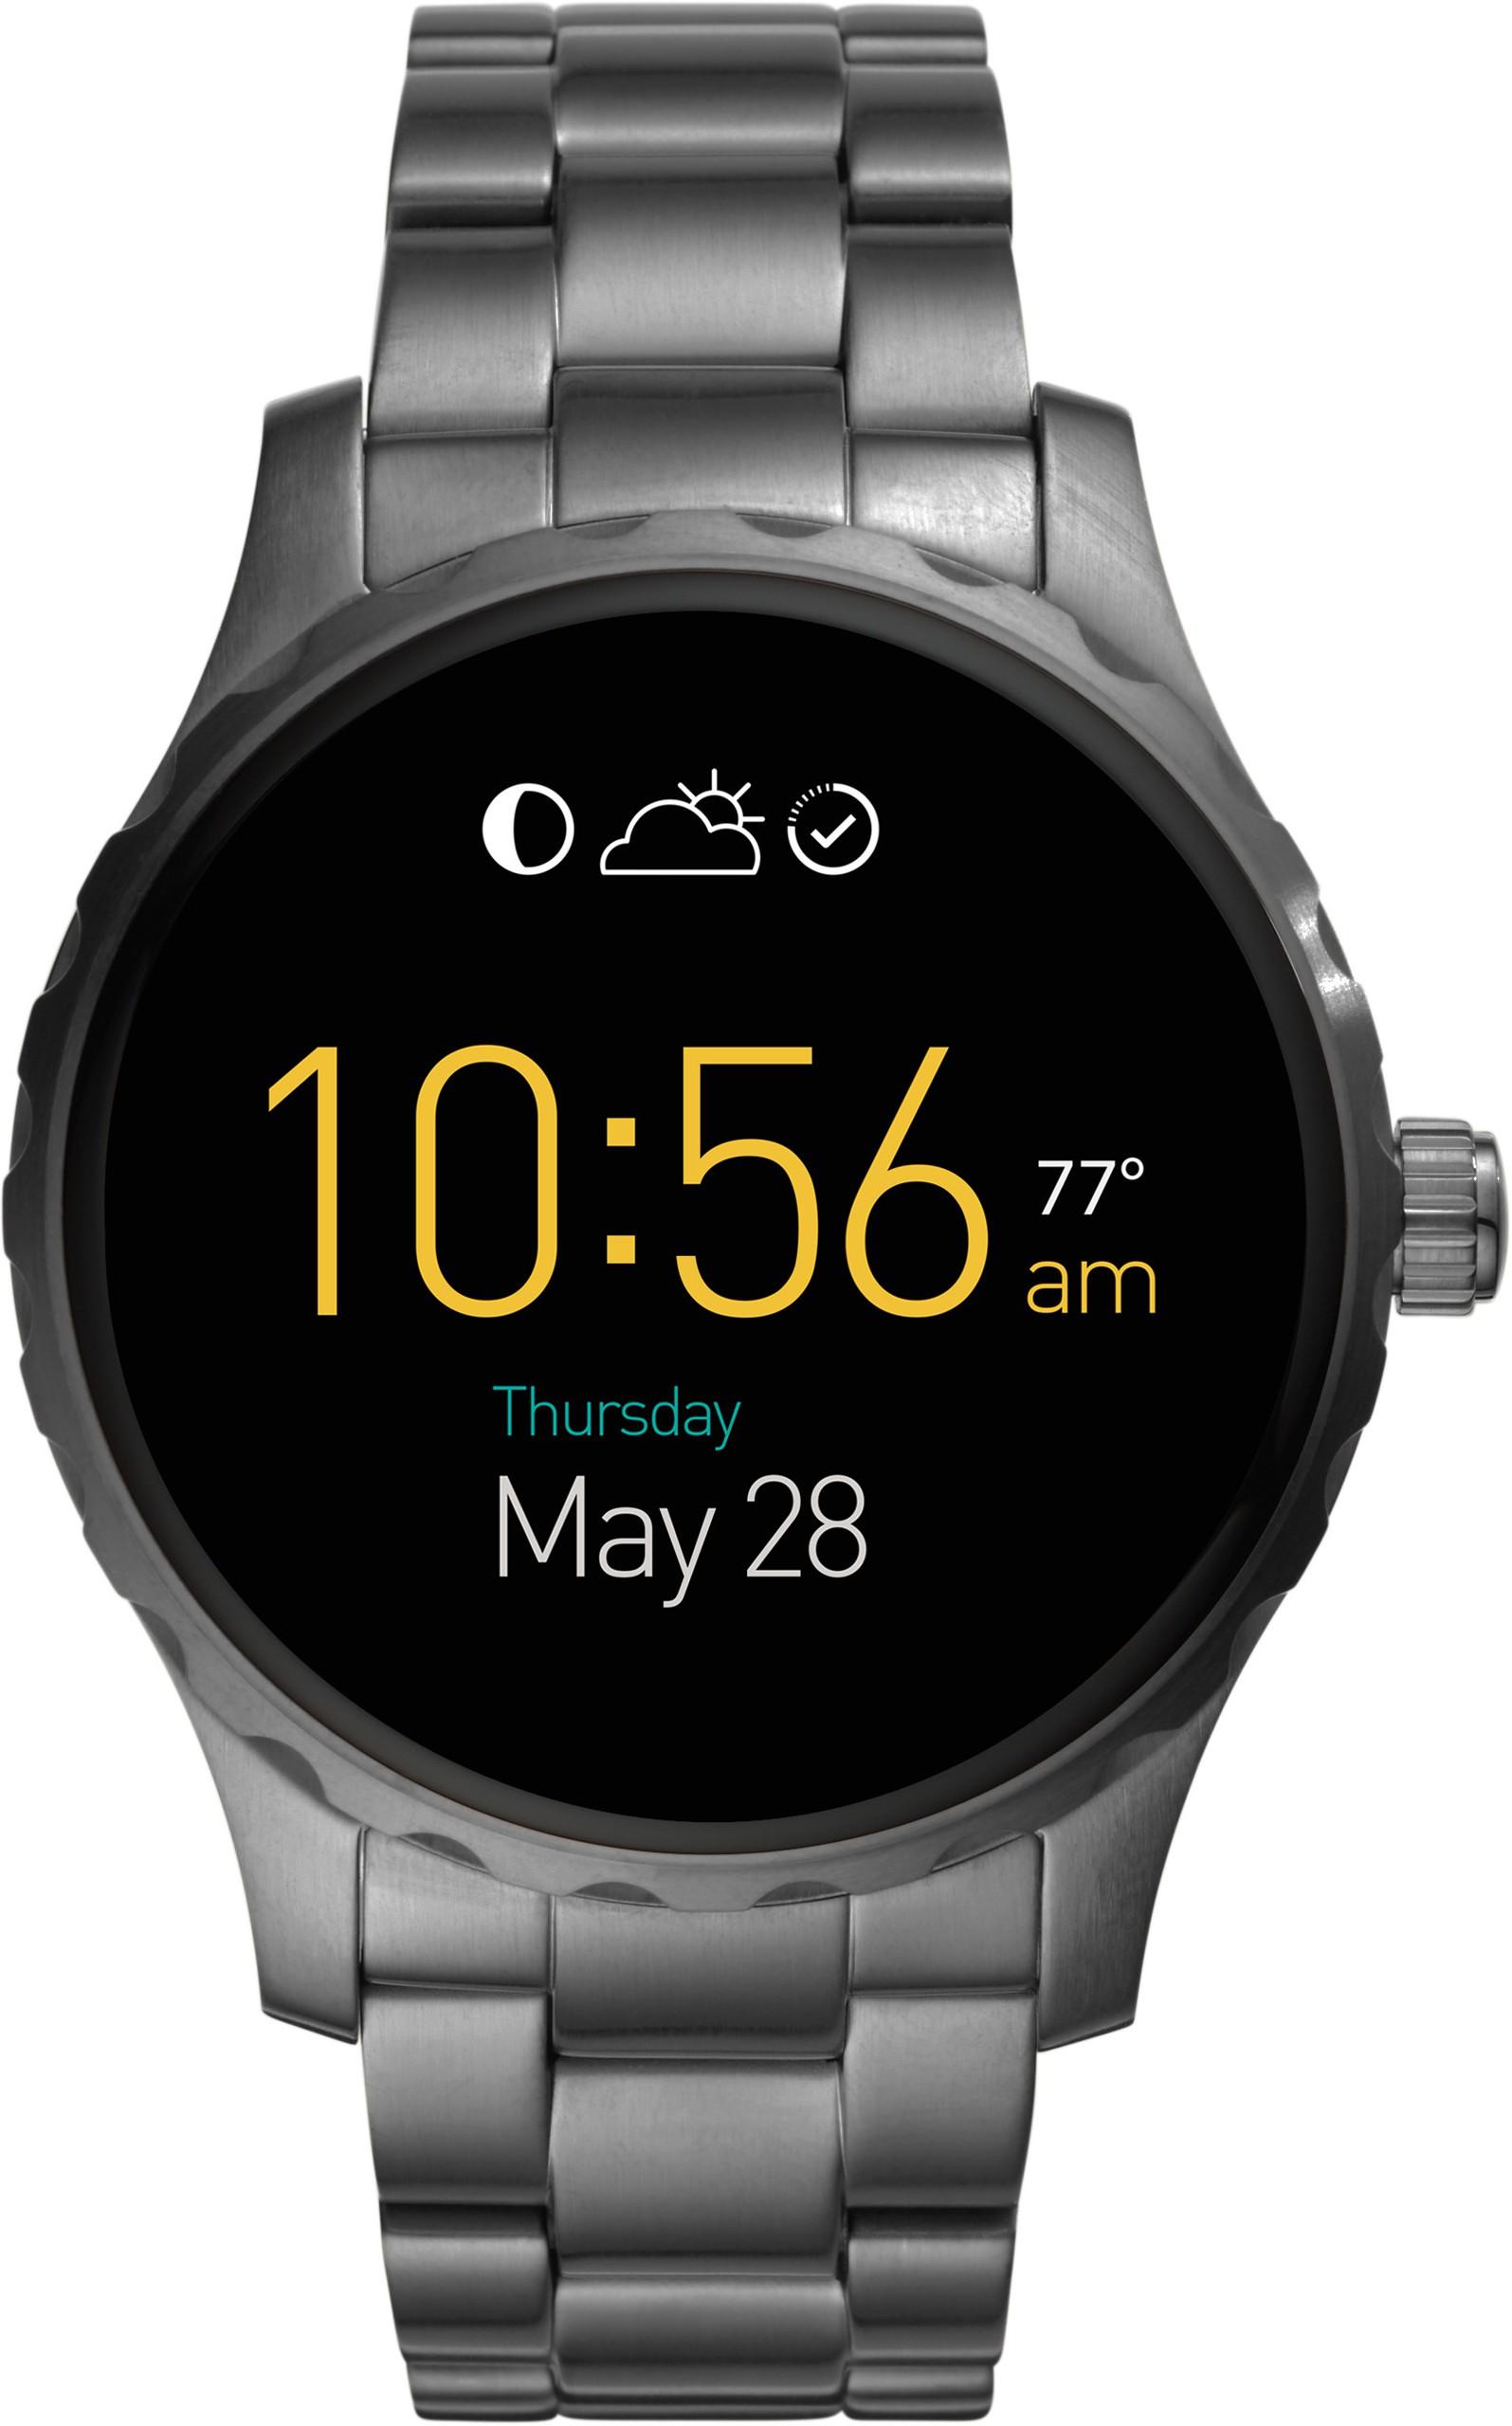 Deals - Raipur - Smartwatches <br> Fossil,skagen & More<br> Category - wearable_smart_devices<br> Business - Flipkart.com